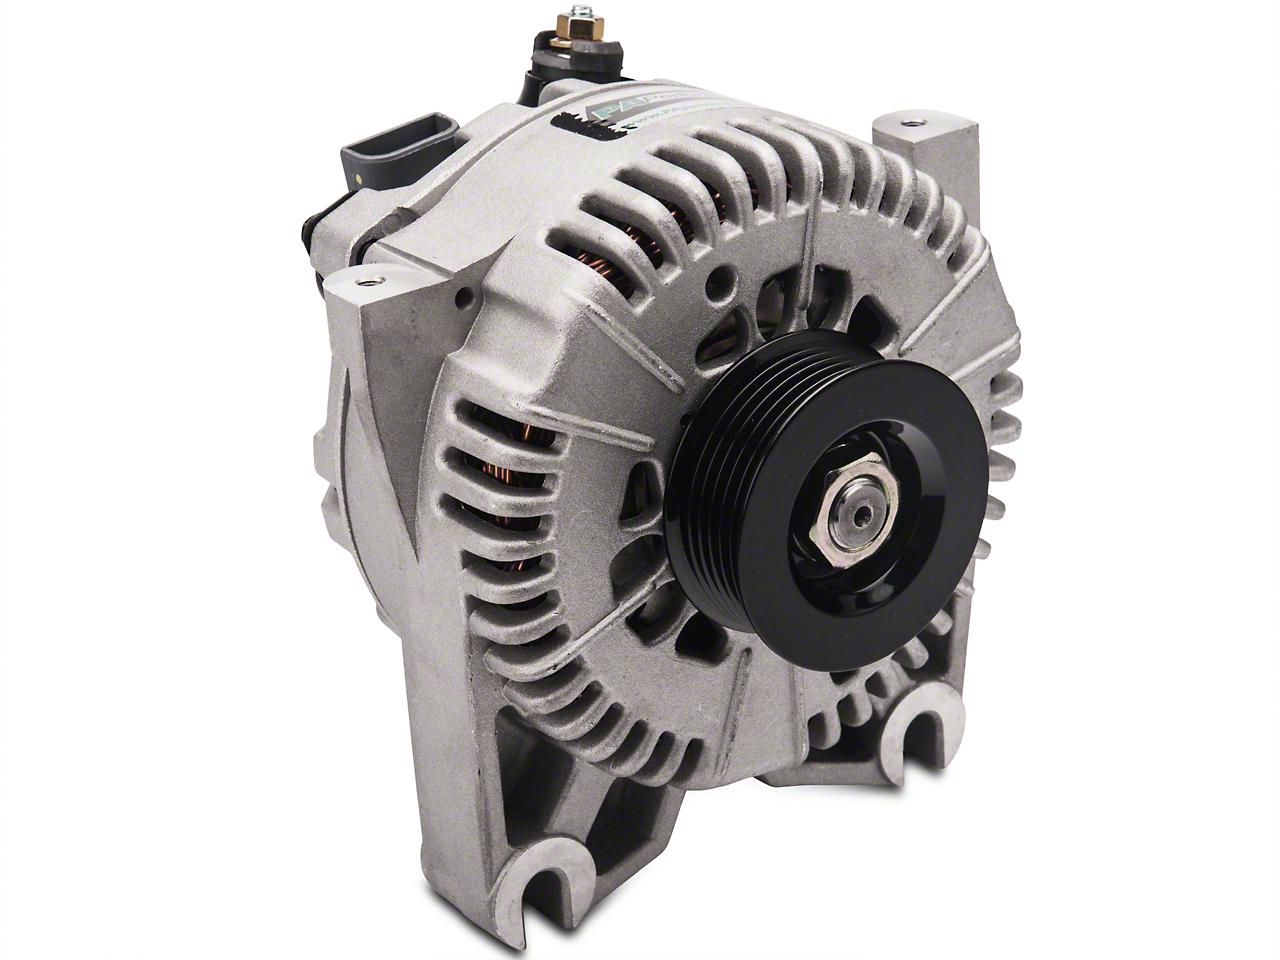 PA Performance Alternator - 200 Amp (96-01 Cobra, 03-04 Mach 1, 01 Bullitt)